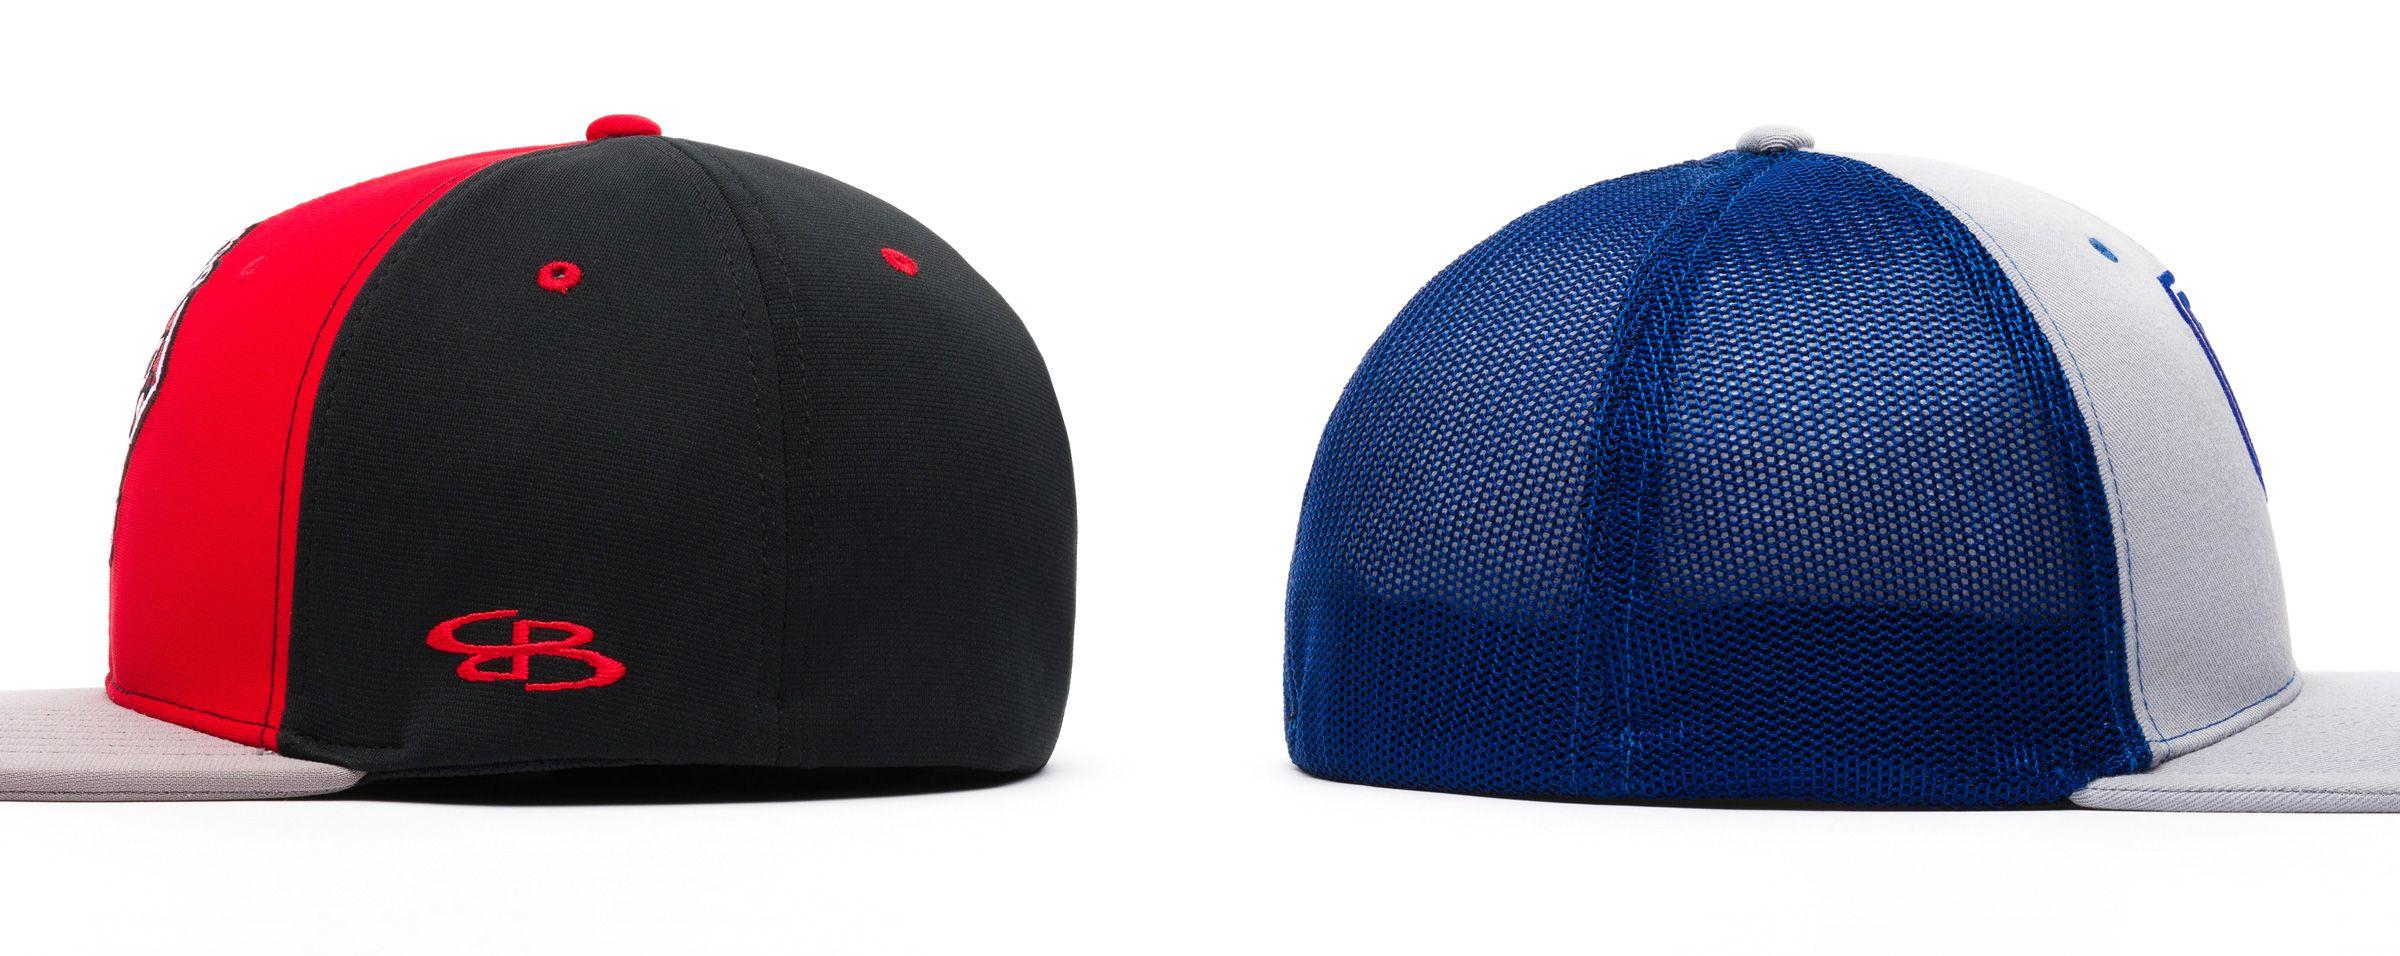 4603e0b270548c Custom Hats - Embroidered & Full Dye | Boombah